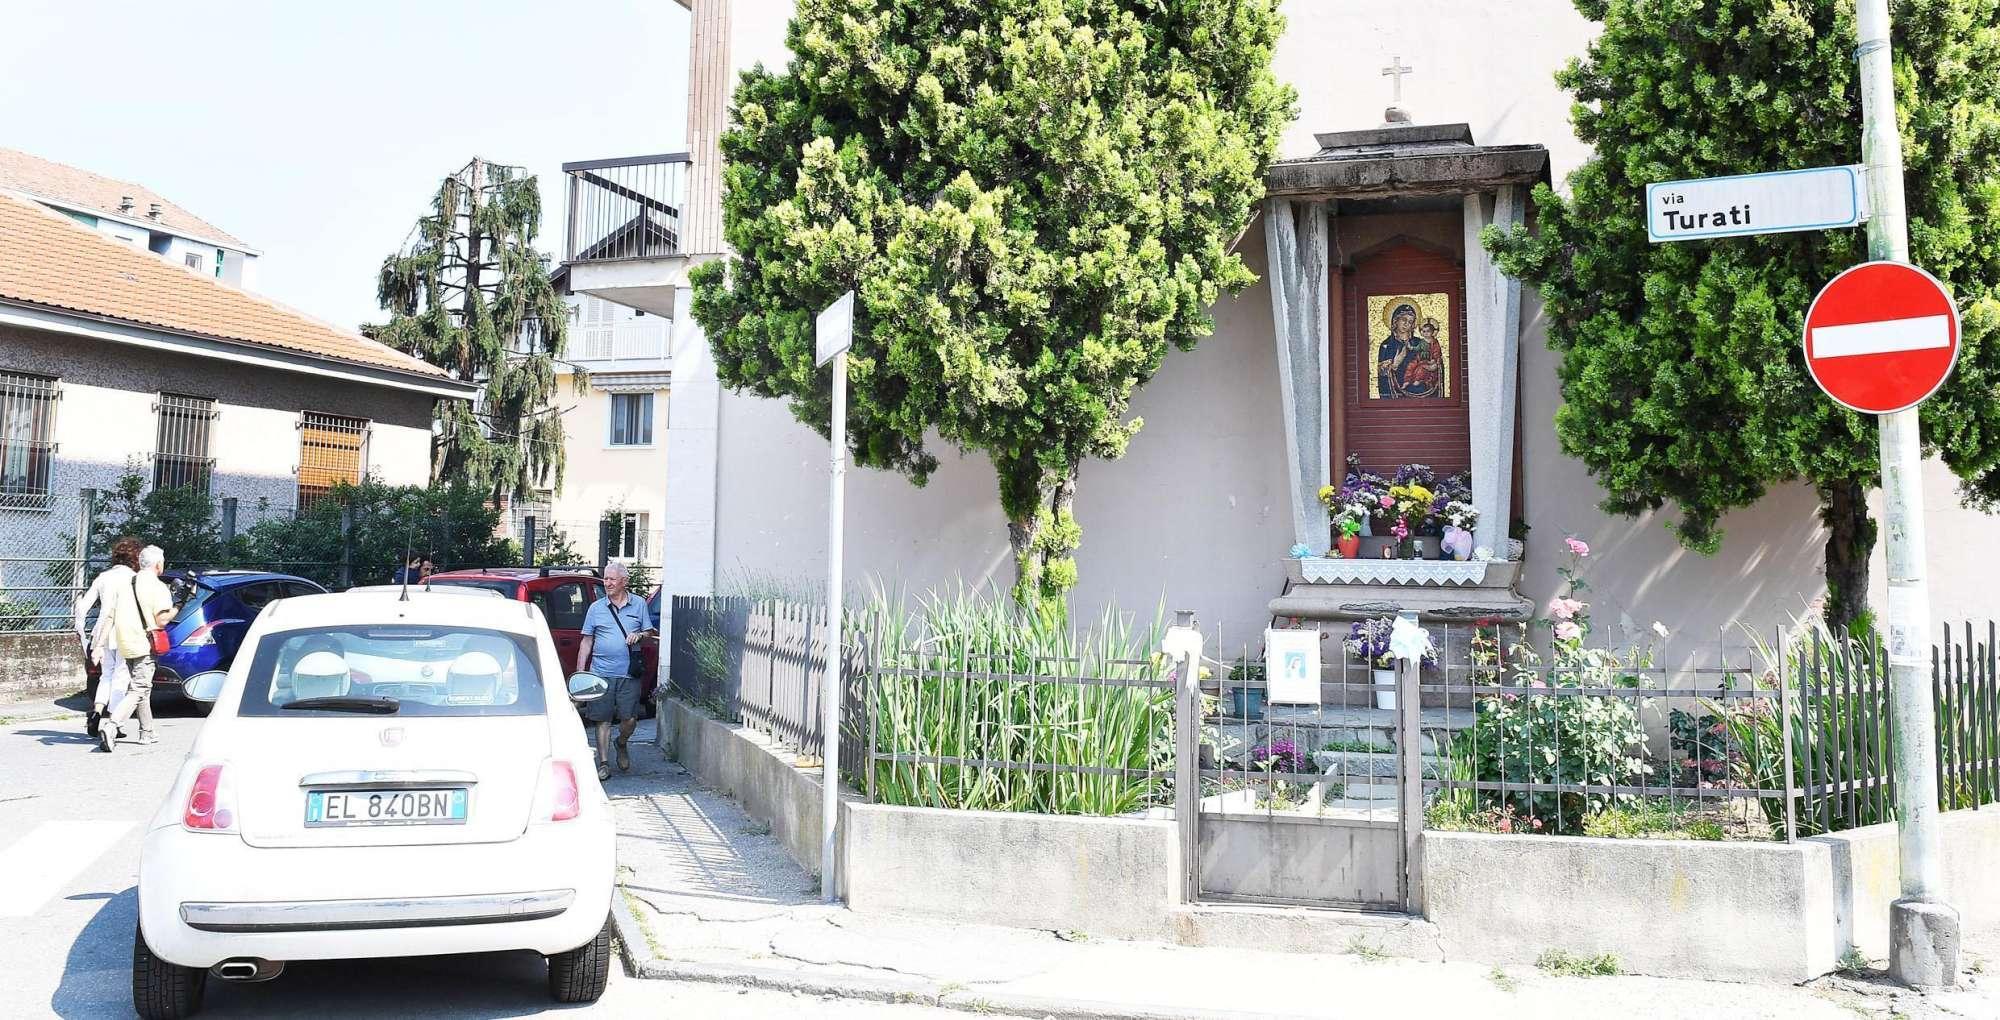 OspedaleInterrogata Abbandonato TorinoNeonato In Muore Strada n0N8XwPkO